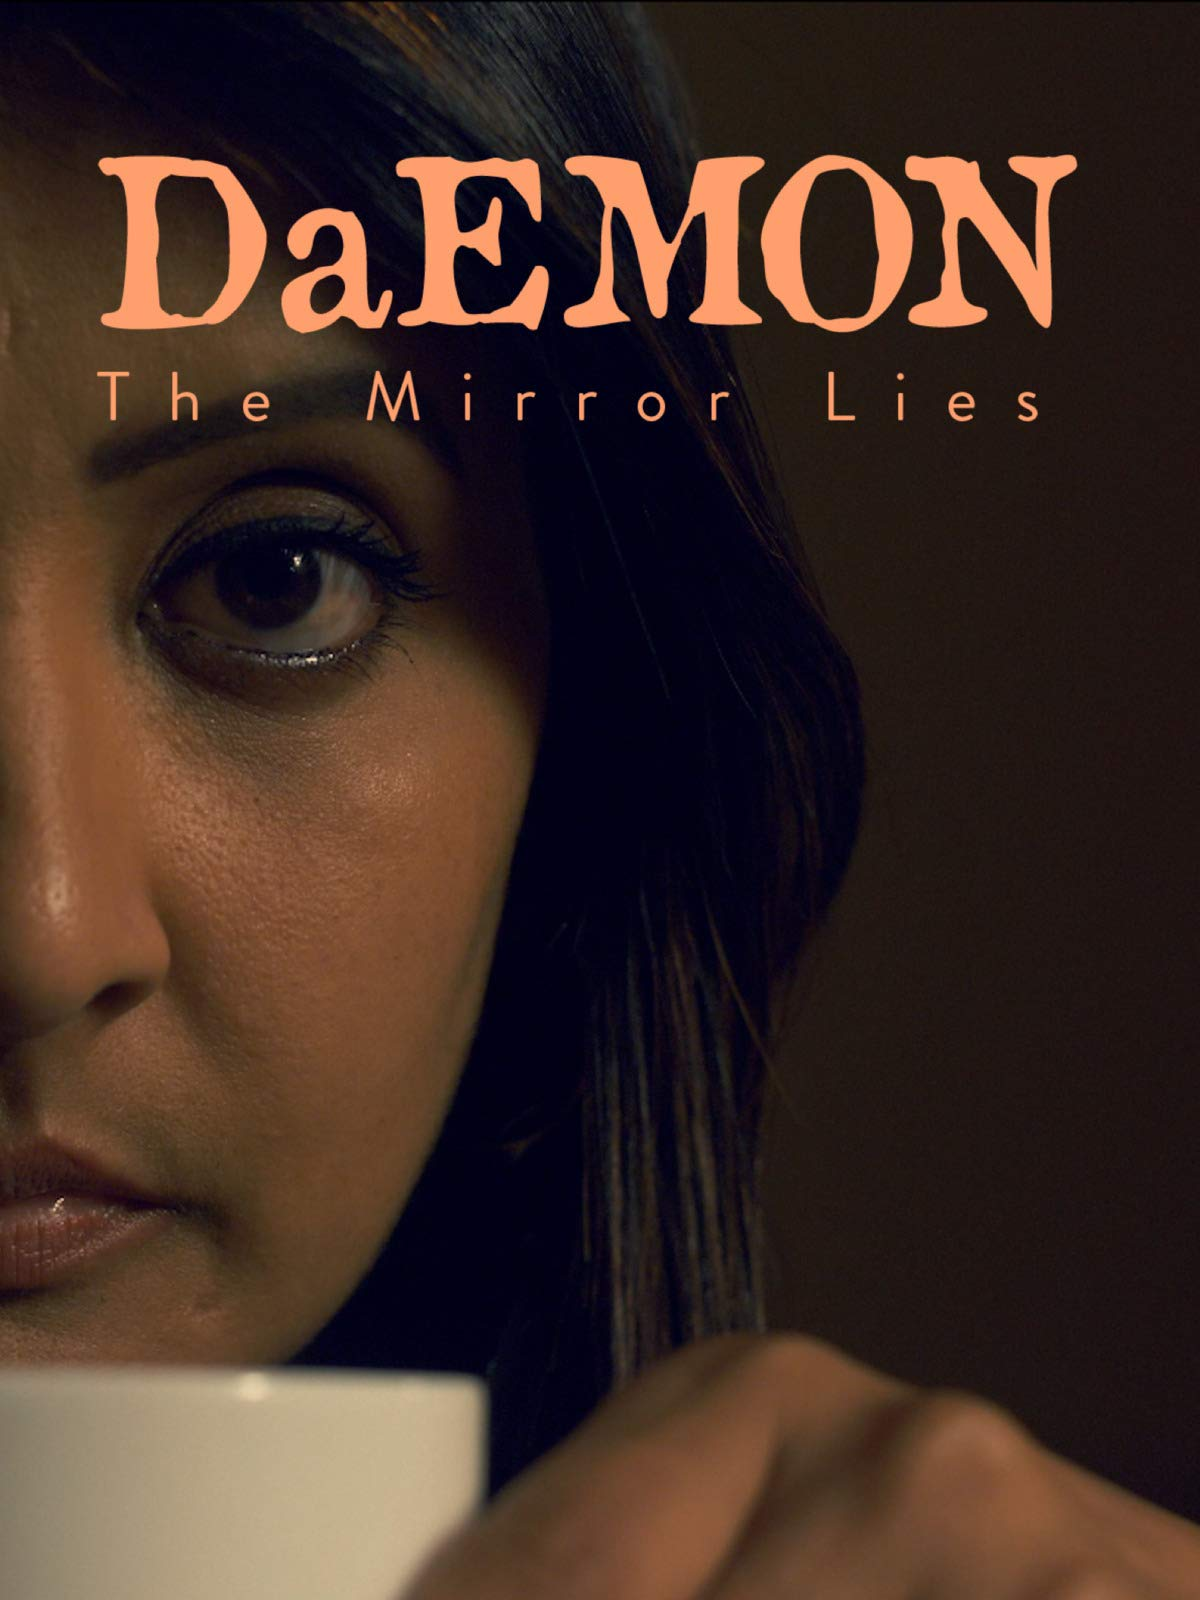 DaEMON The Mirror Lies